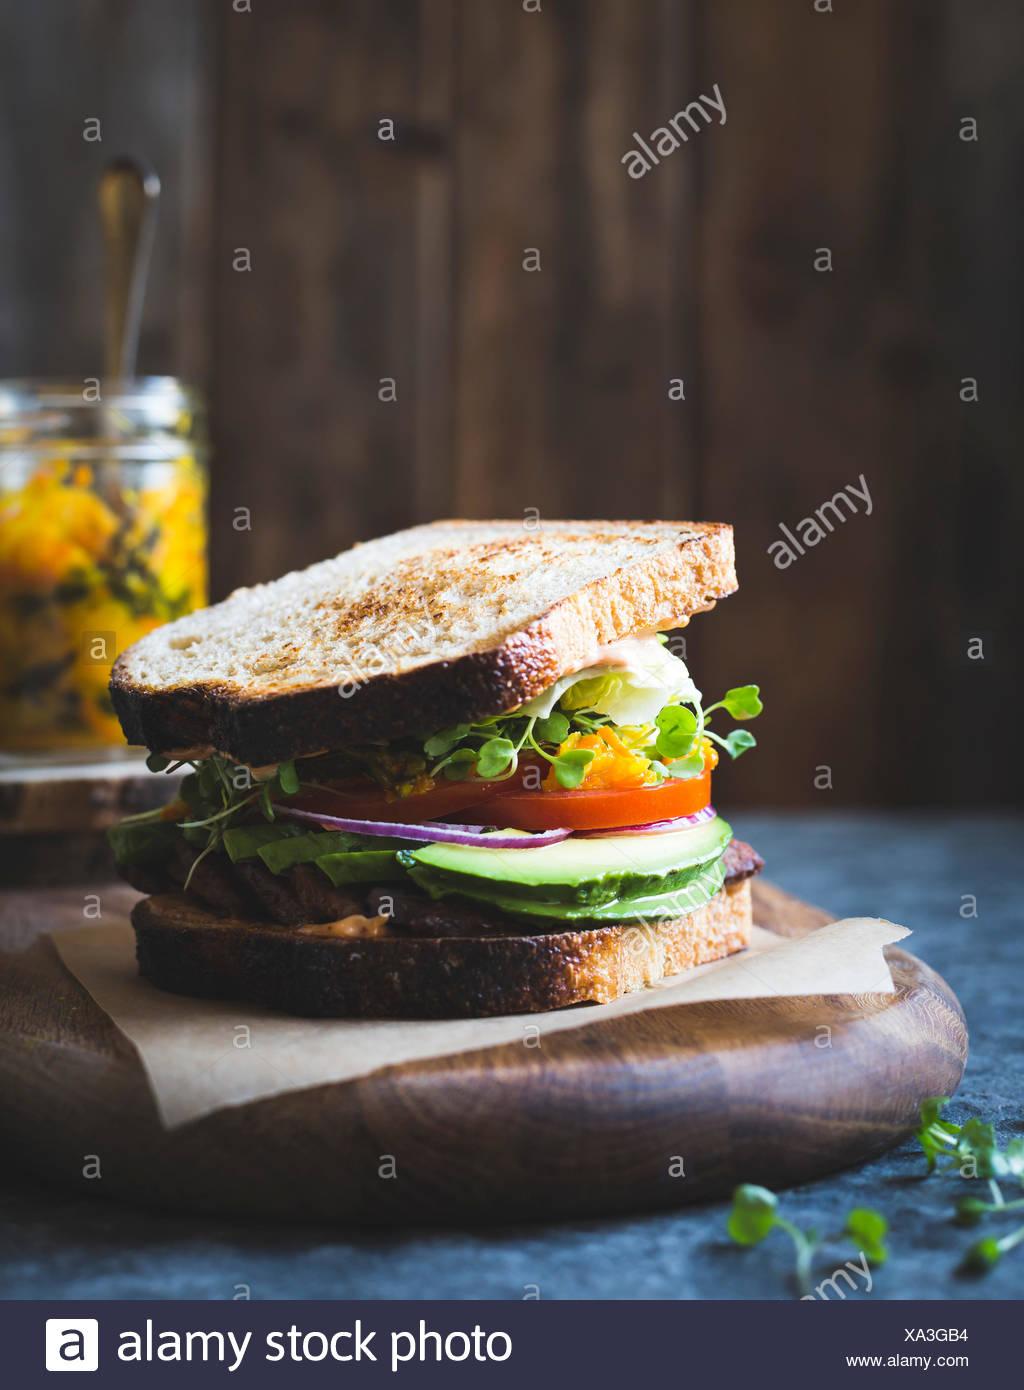 Tempah bacon, lettuce, tomato sandwich with kimchi, Avocado and Chipotle Mayonnaise - Stock Image